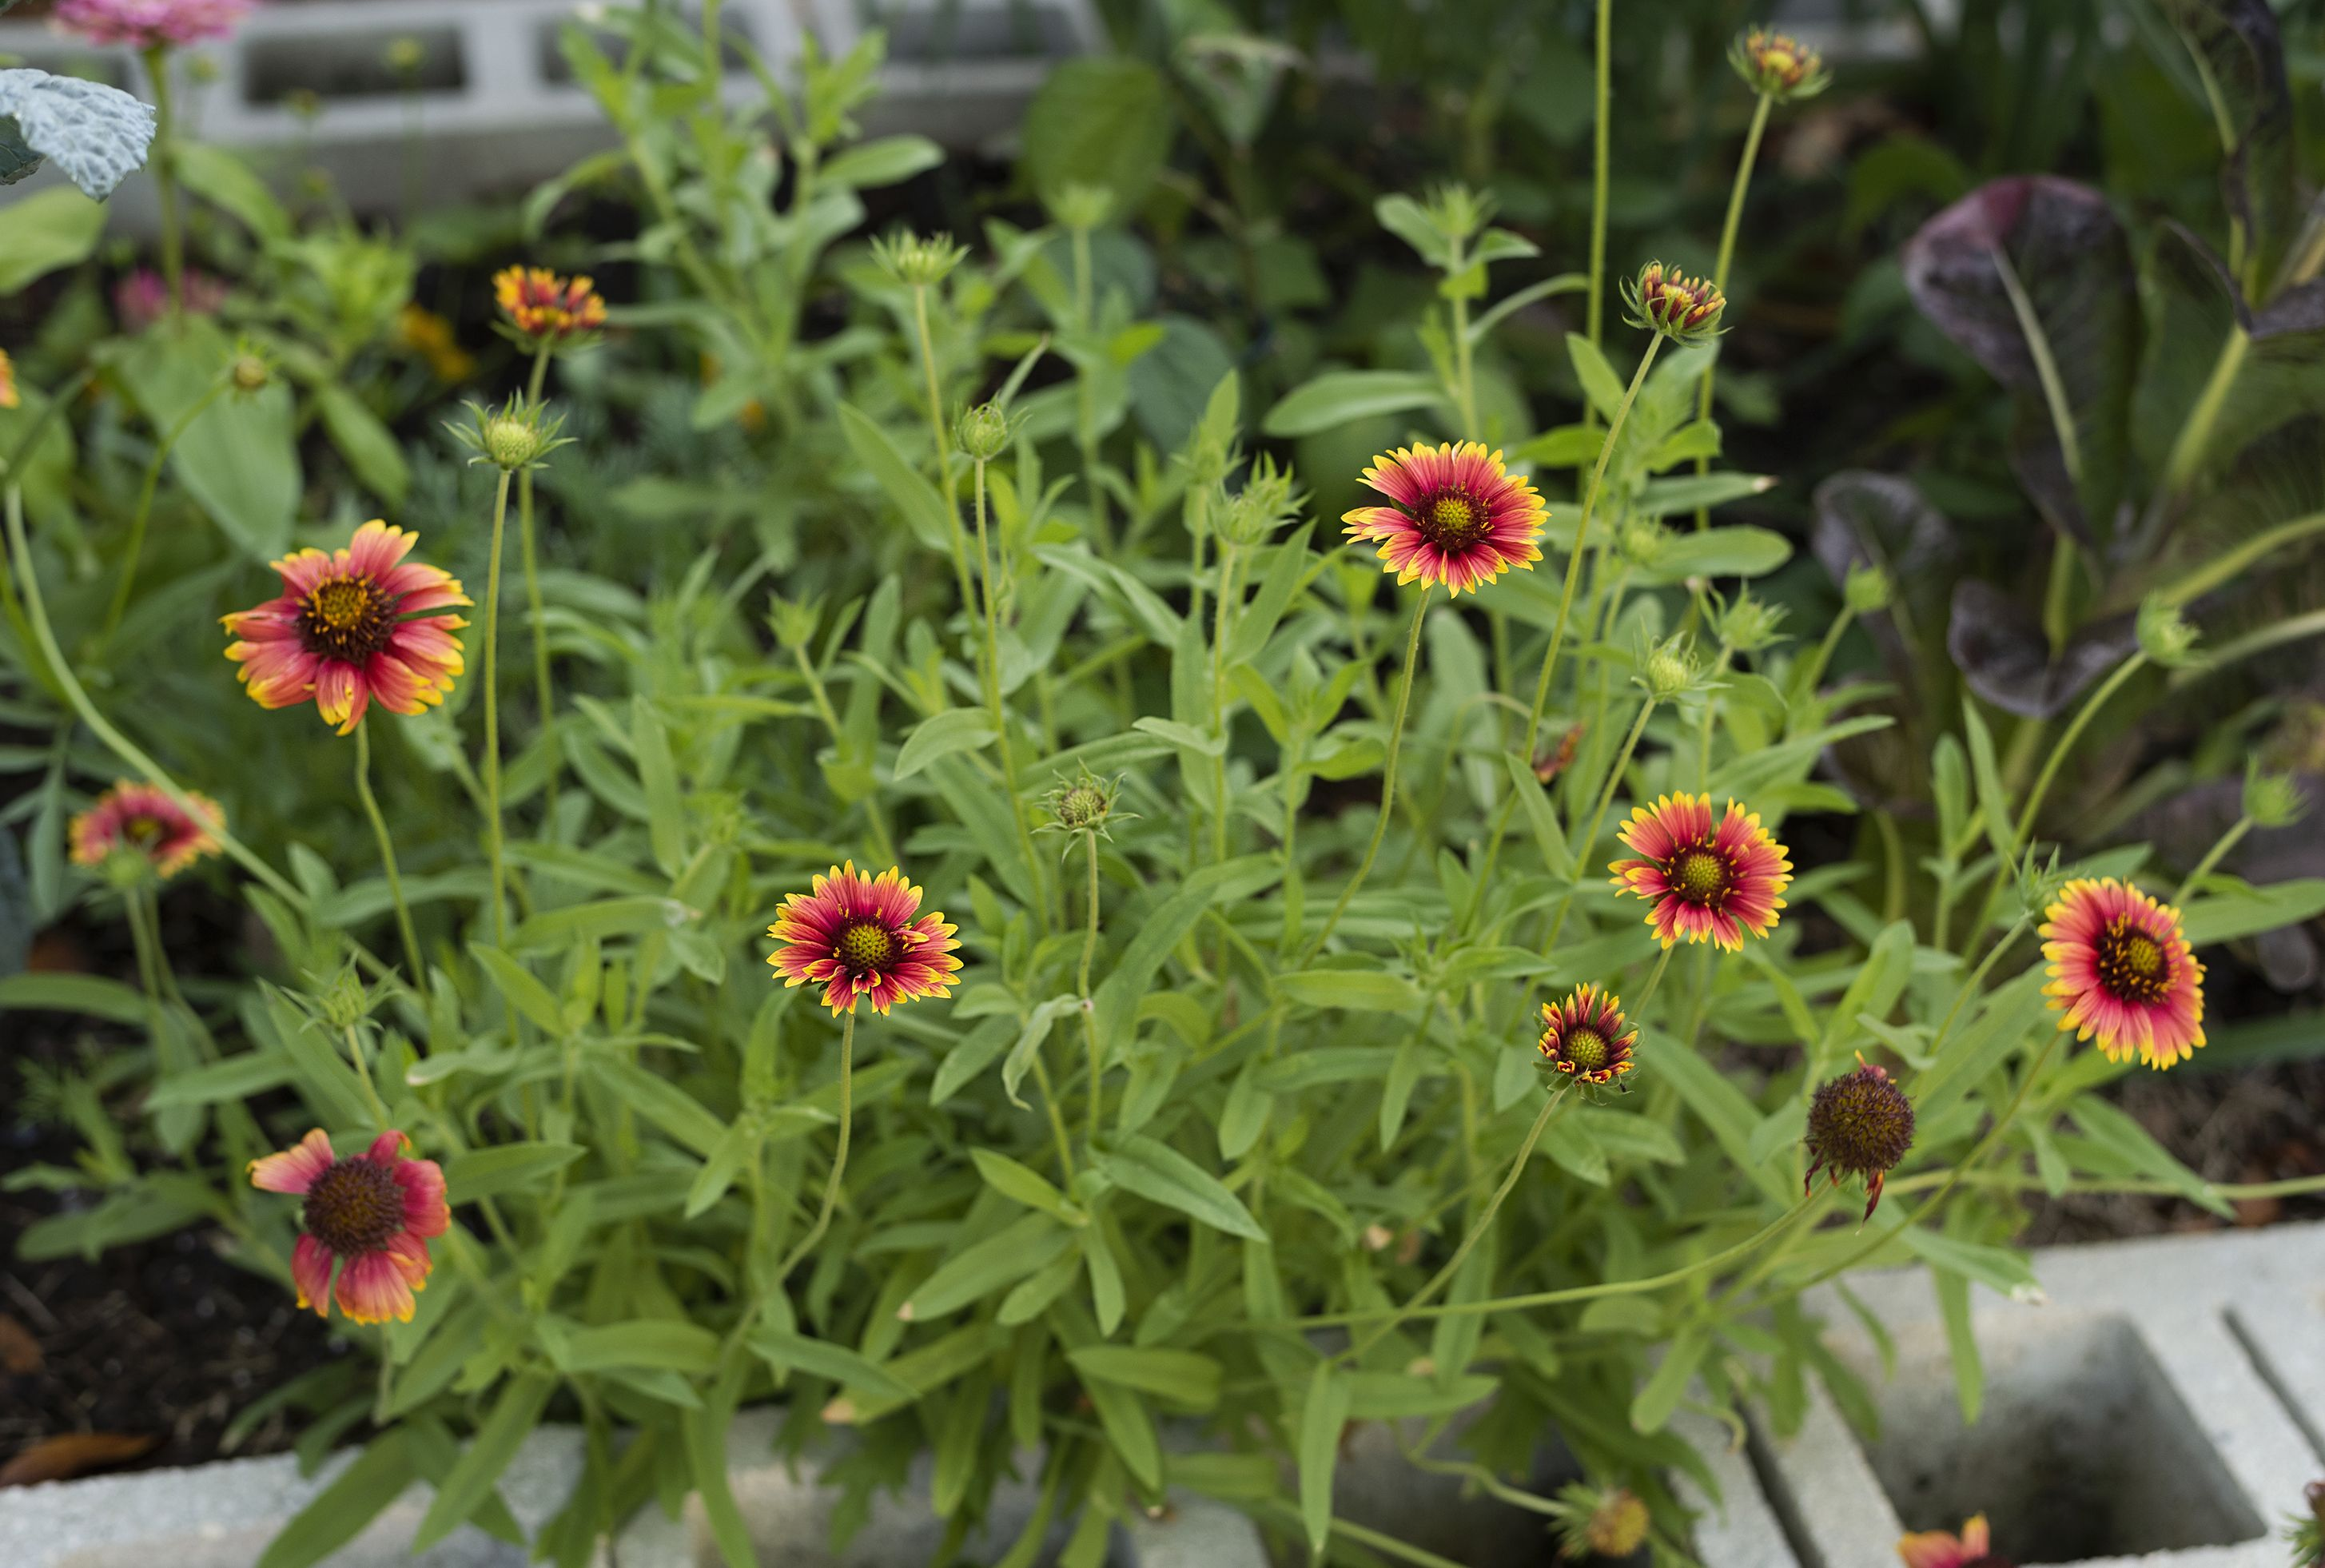 Gaillardia easy to grow in florida flower growing